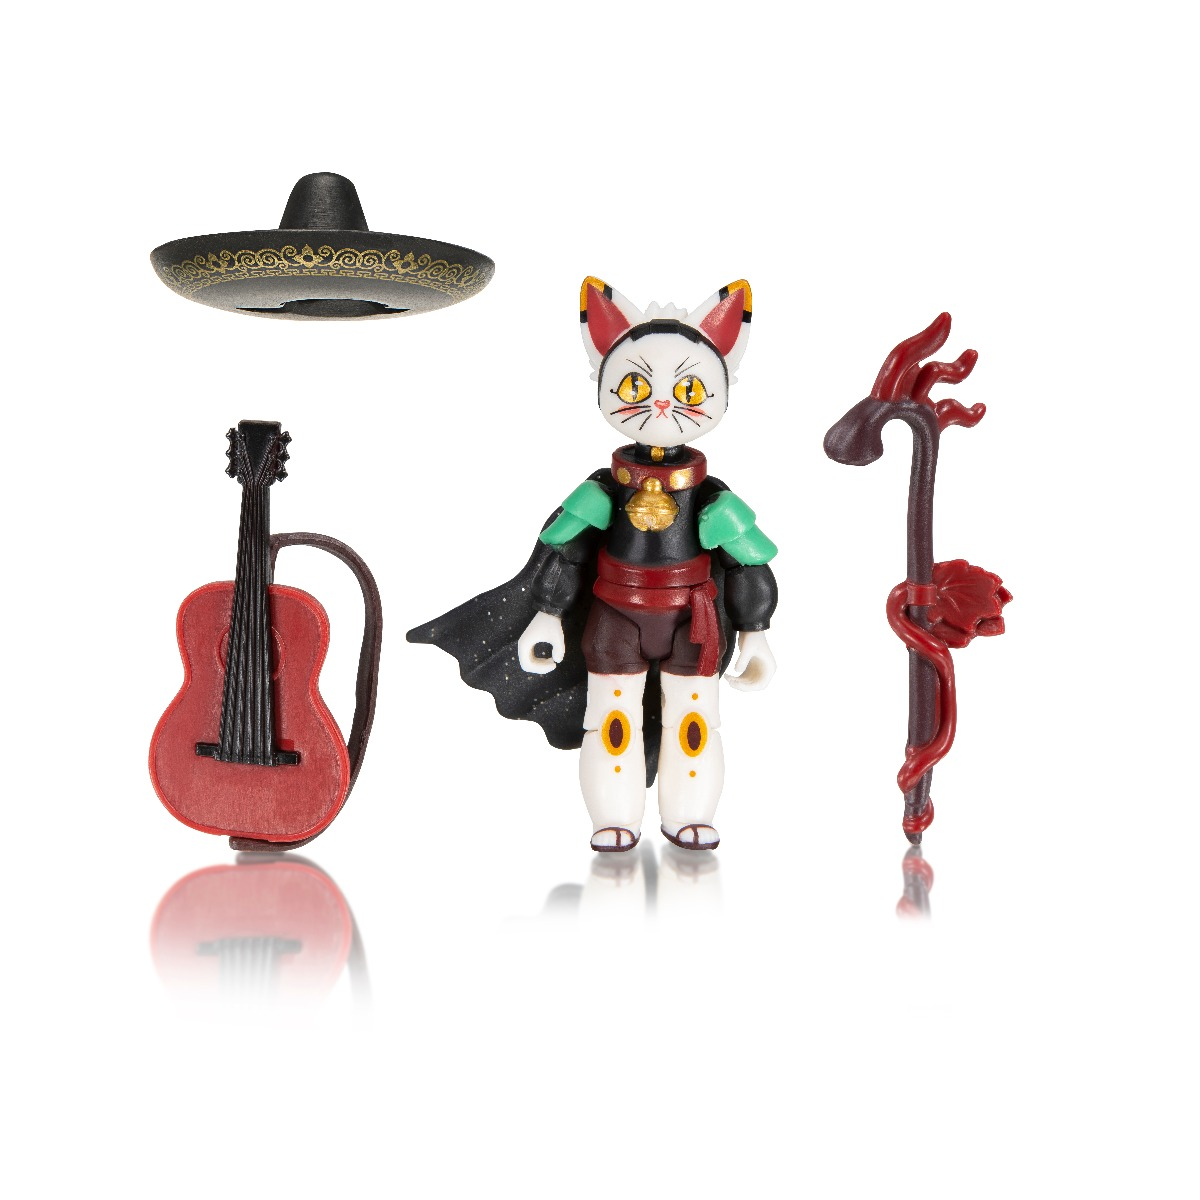 Figurina Roblox, Lucky Gatito, S7, ROB0269